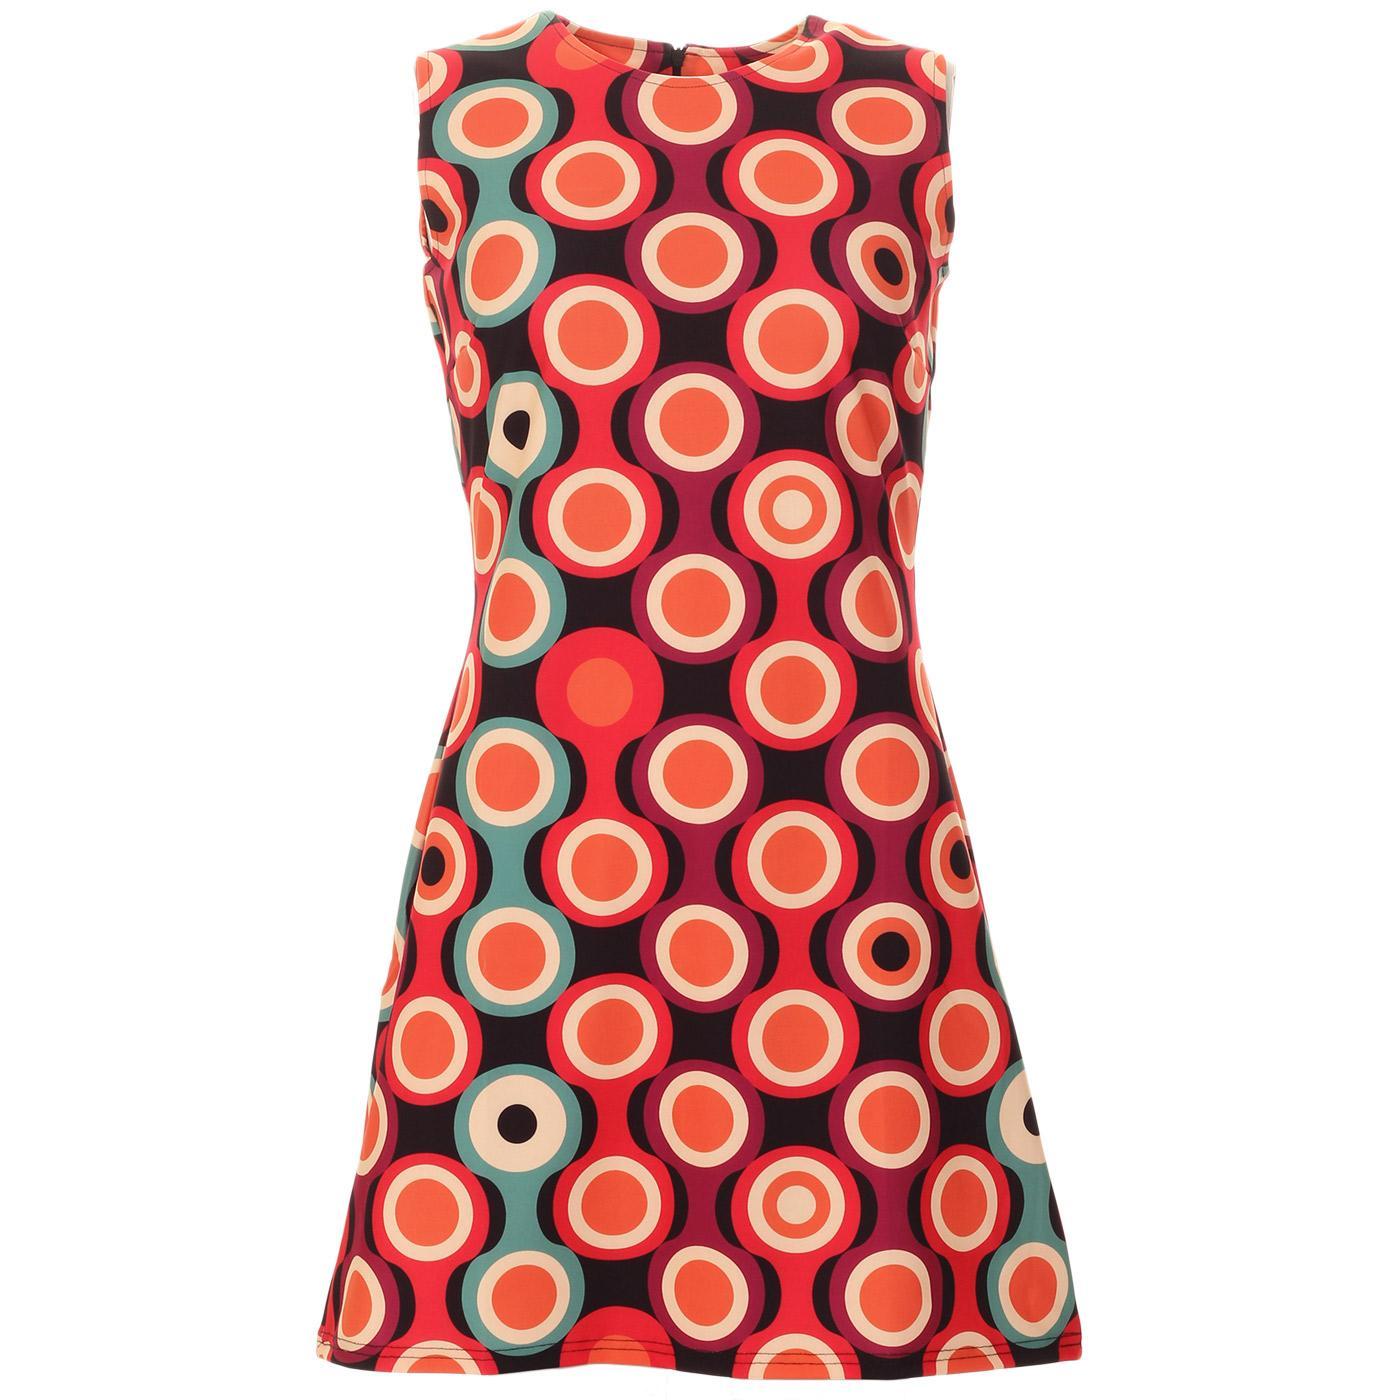 Takka Psych-Out! MADCAP ENGLAND 60s Mod Dress B/B